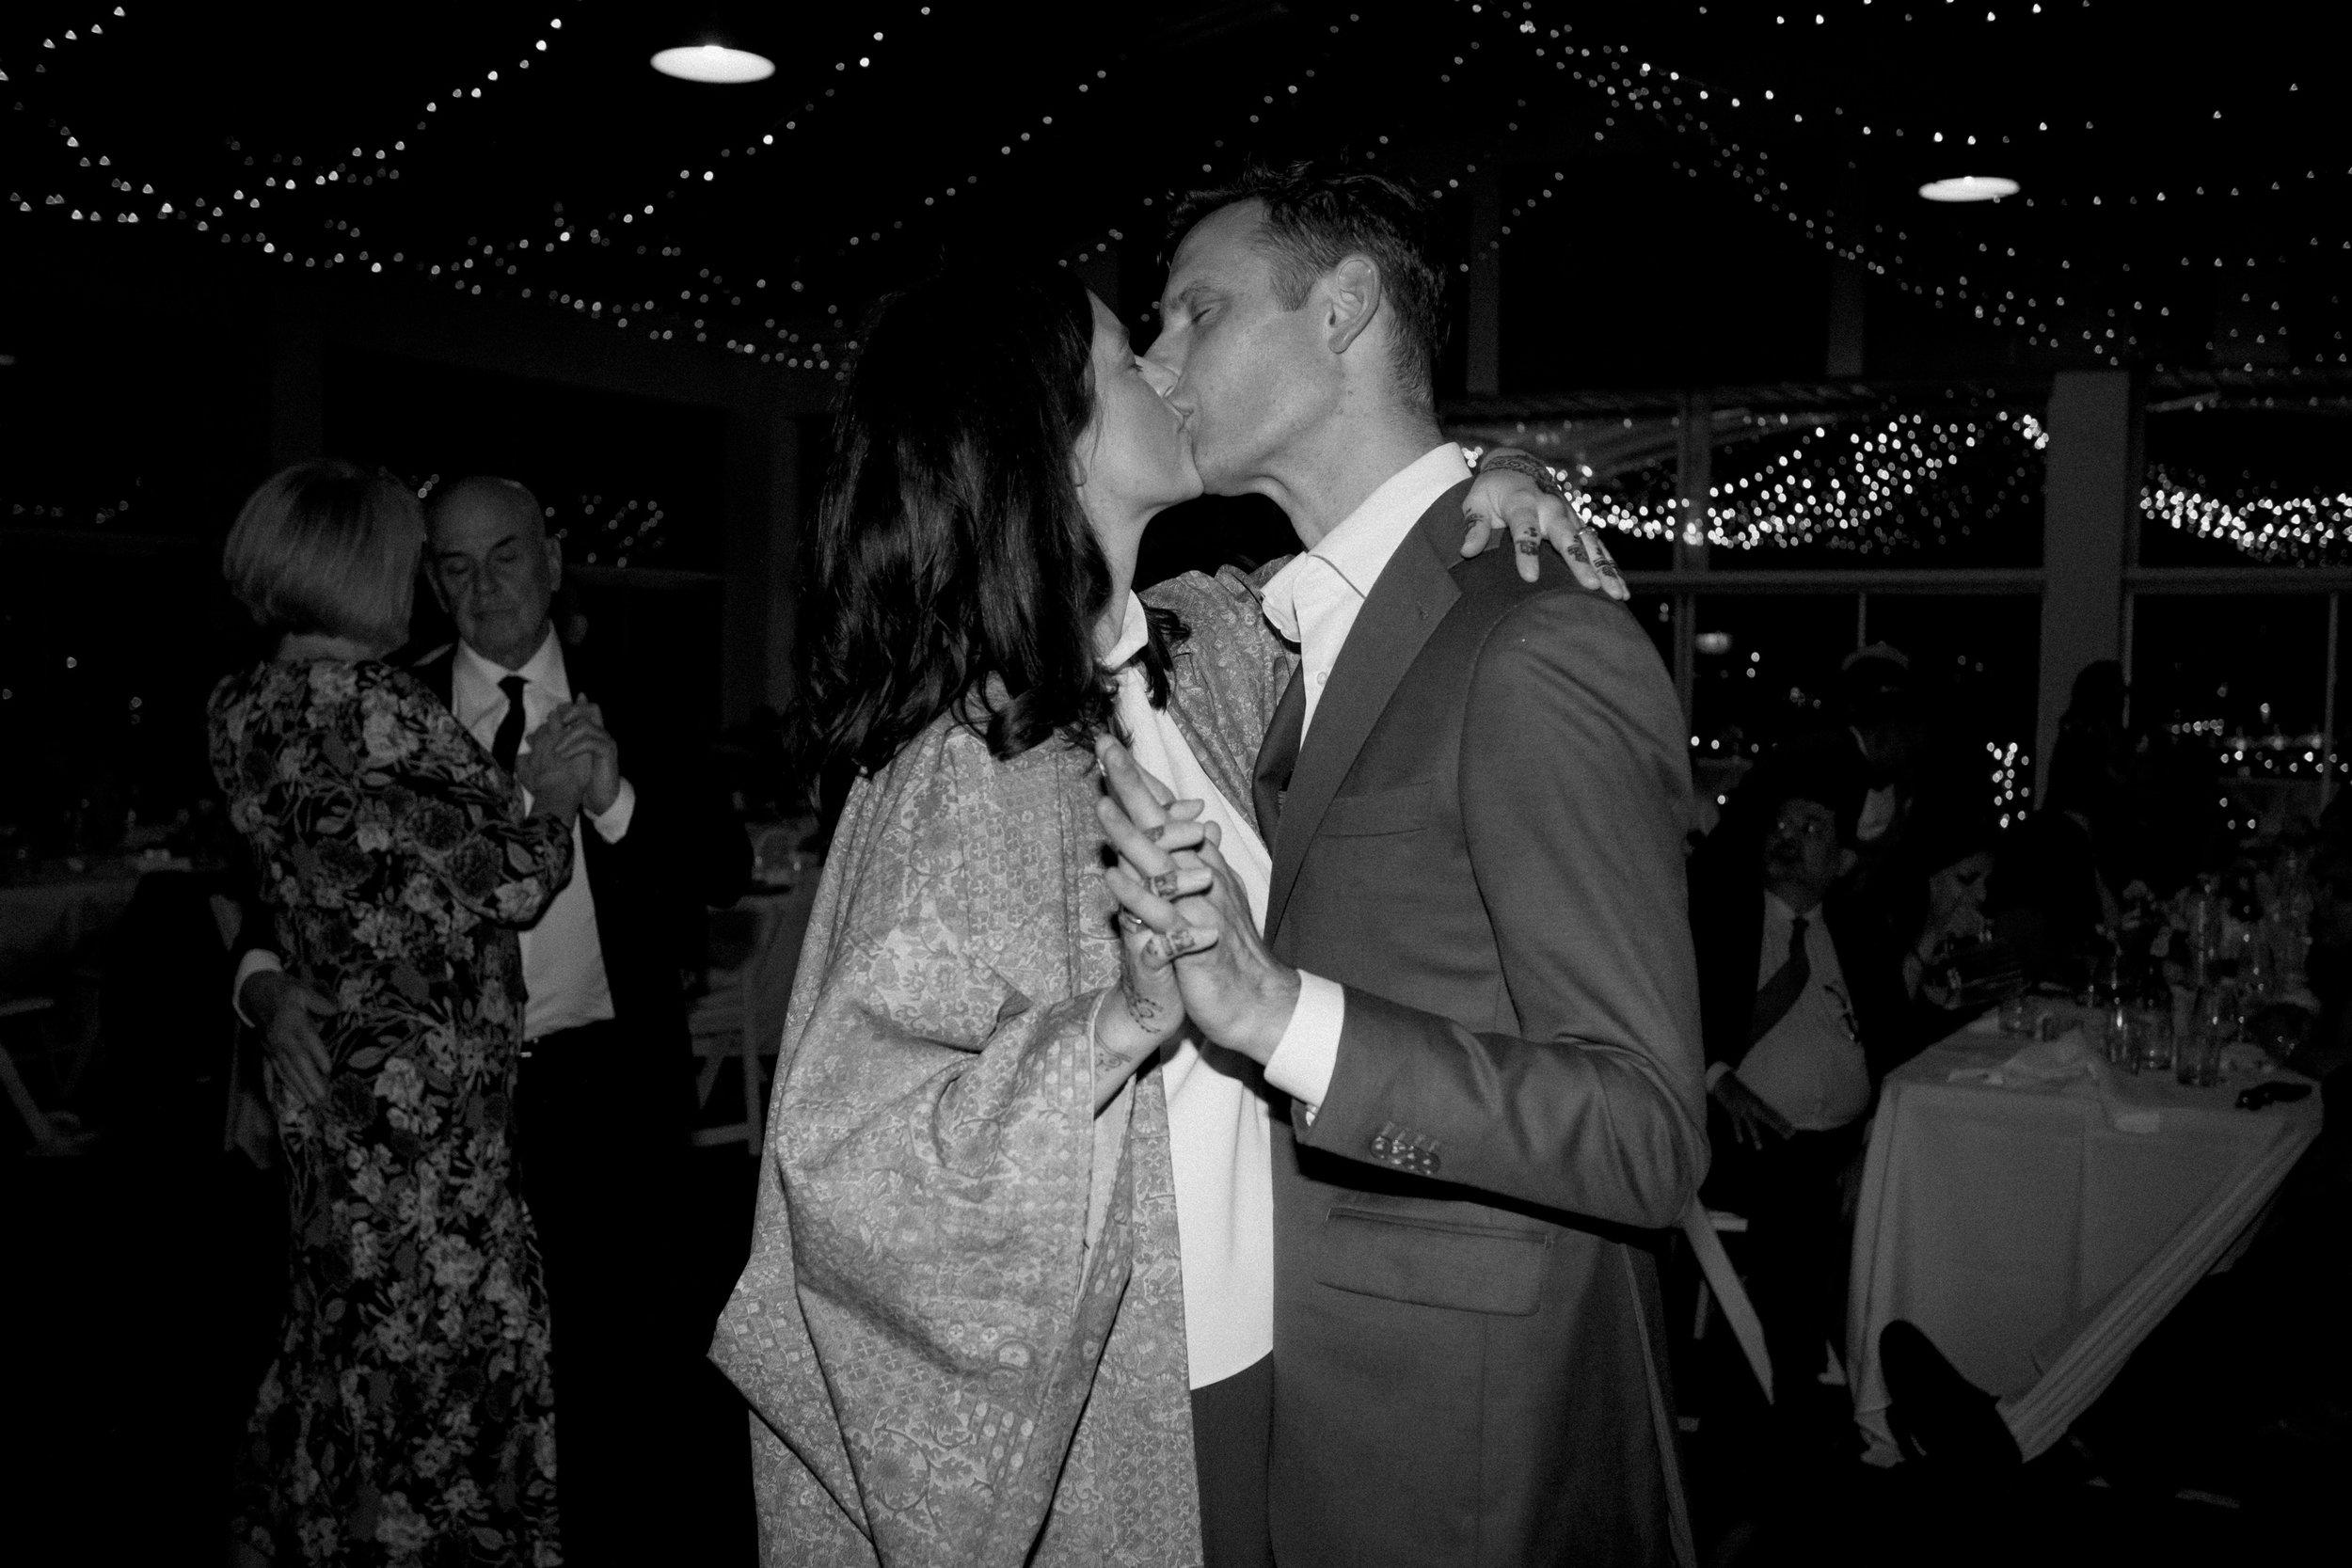 Amelia+Ani_Wedding_May2019_credit_OneDaySomewherePhotography-301.jpg